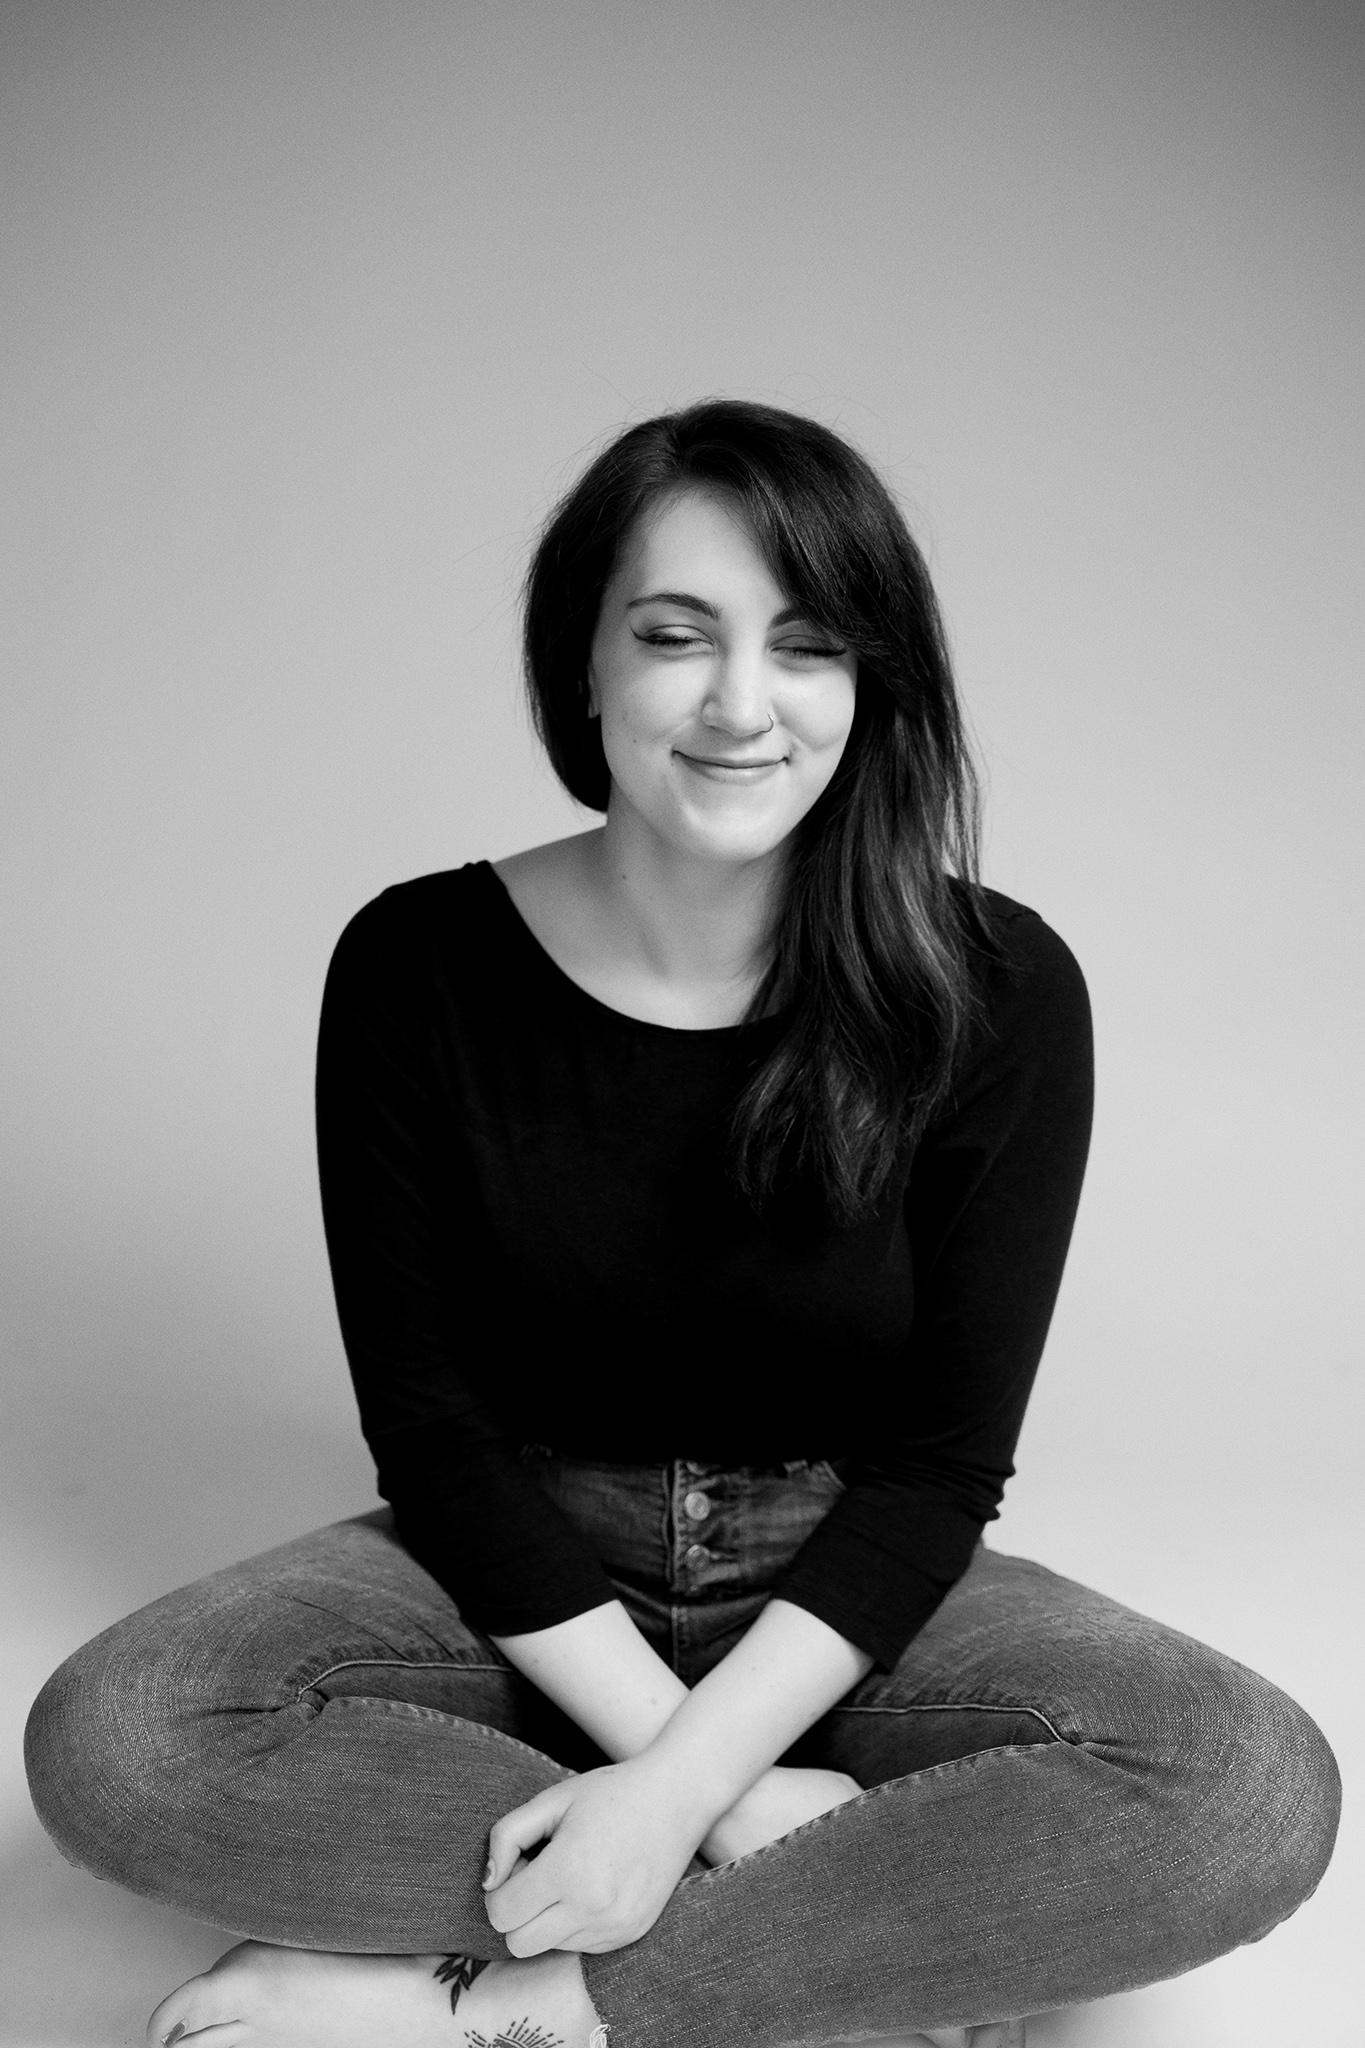 Olympia Washington Boudoir Portrait Photographer - Brittany Martorella